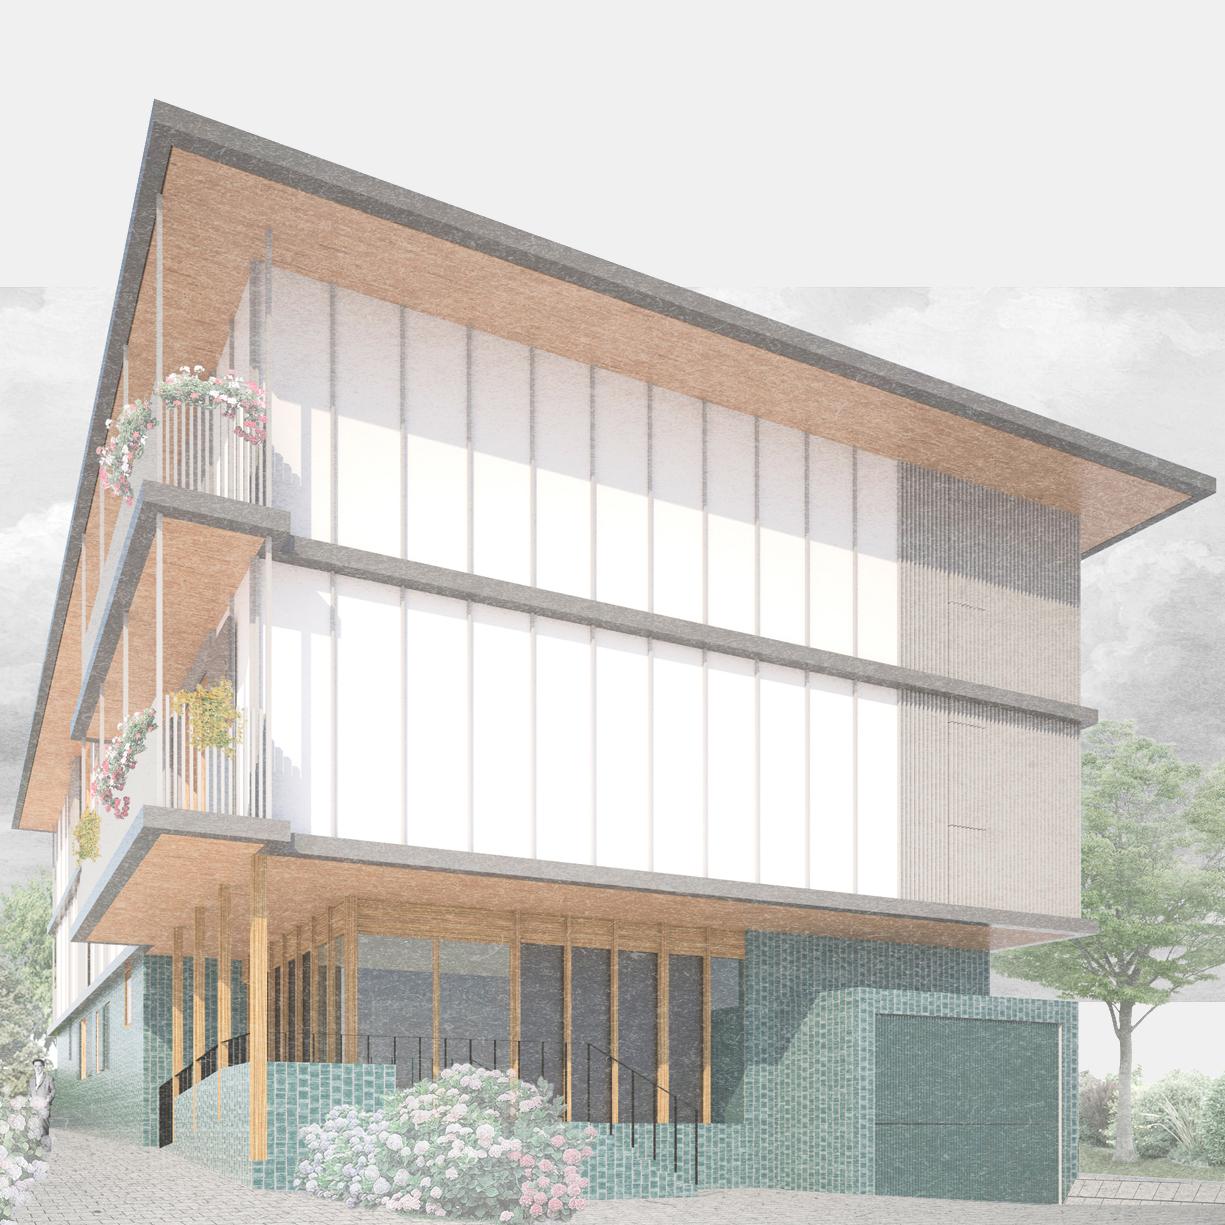 Housing |  Social Housing | Bera, Navarra   1st prize